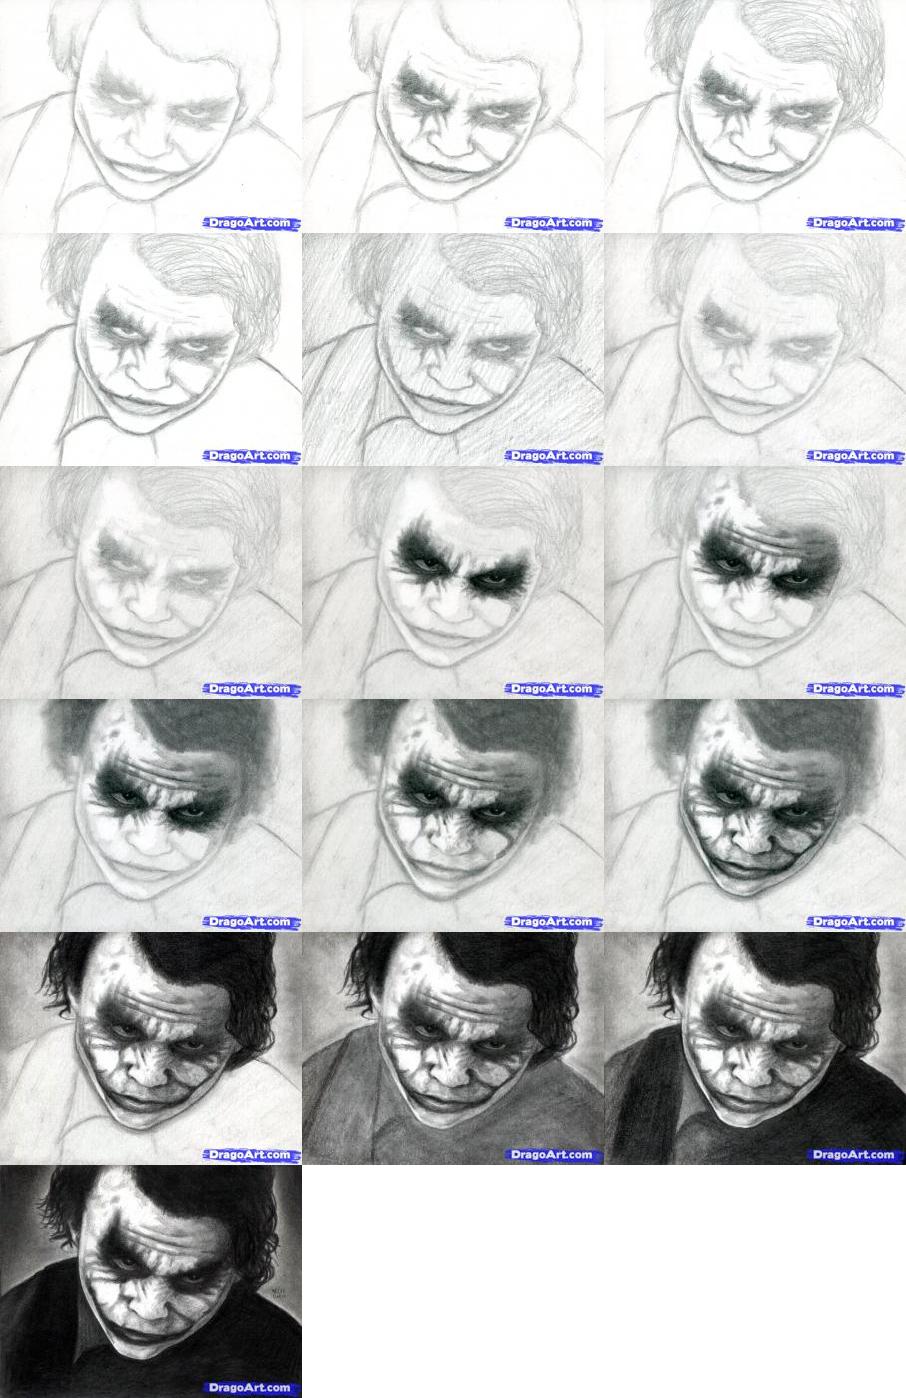 How To Draw The Joker From The Dark Knight Art Tutorials